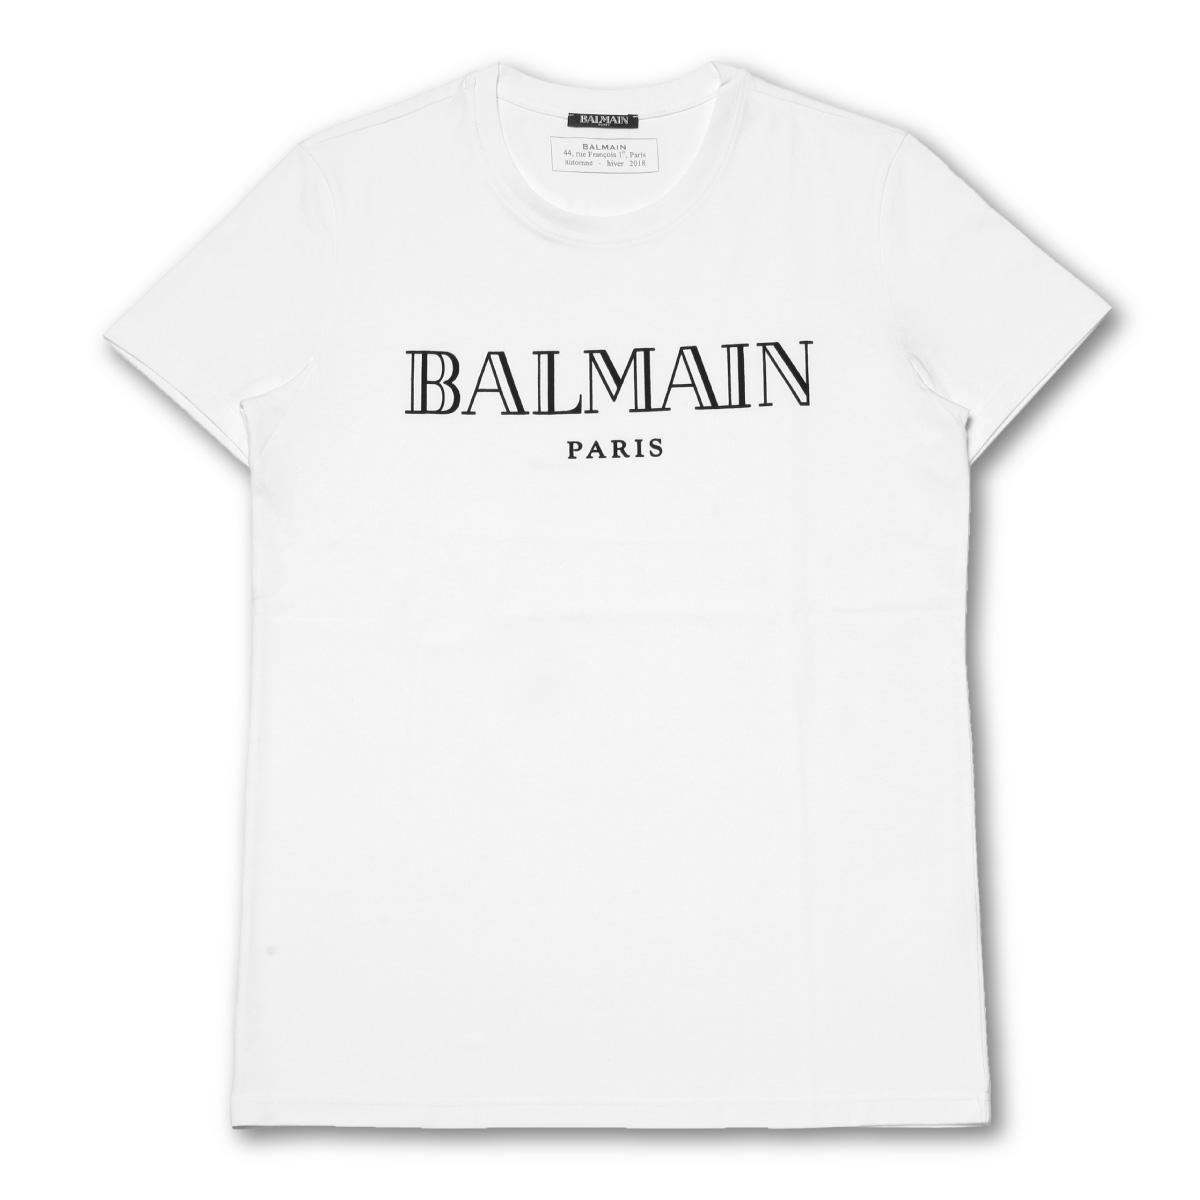 7b035204eb importshopdouble: Baru man BALMAIN T-shirt men W8H8601 I259 100 short  sleeves T-shirt WHITE white | Rakuten Global Market